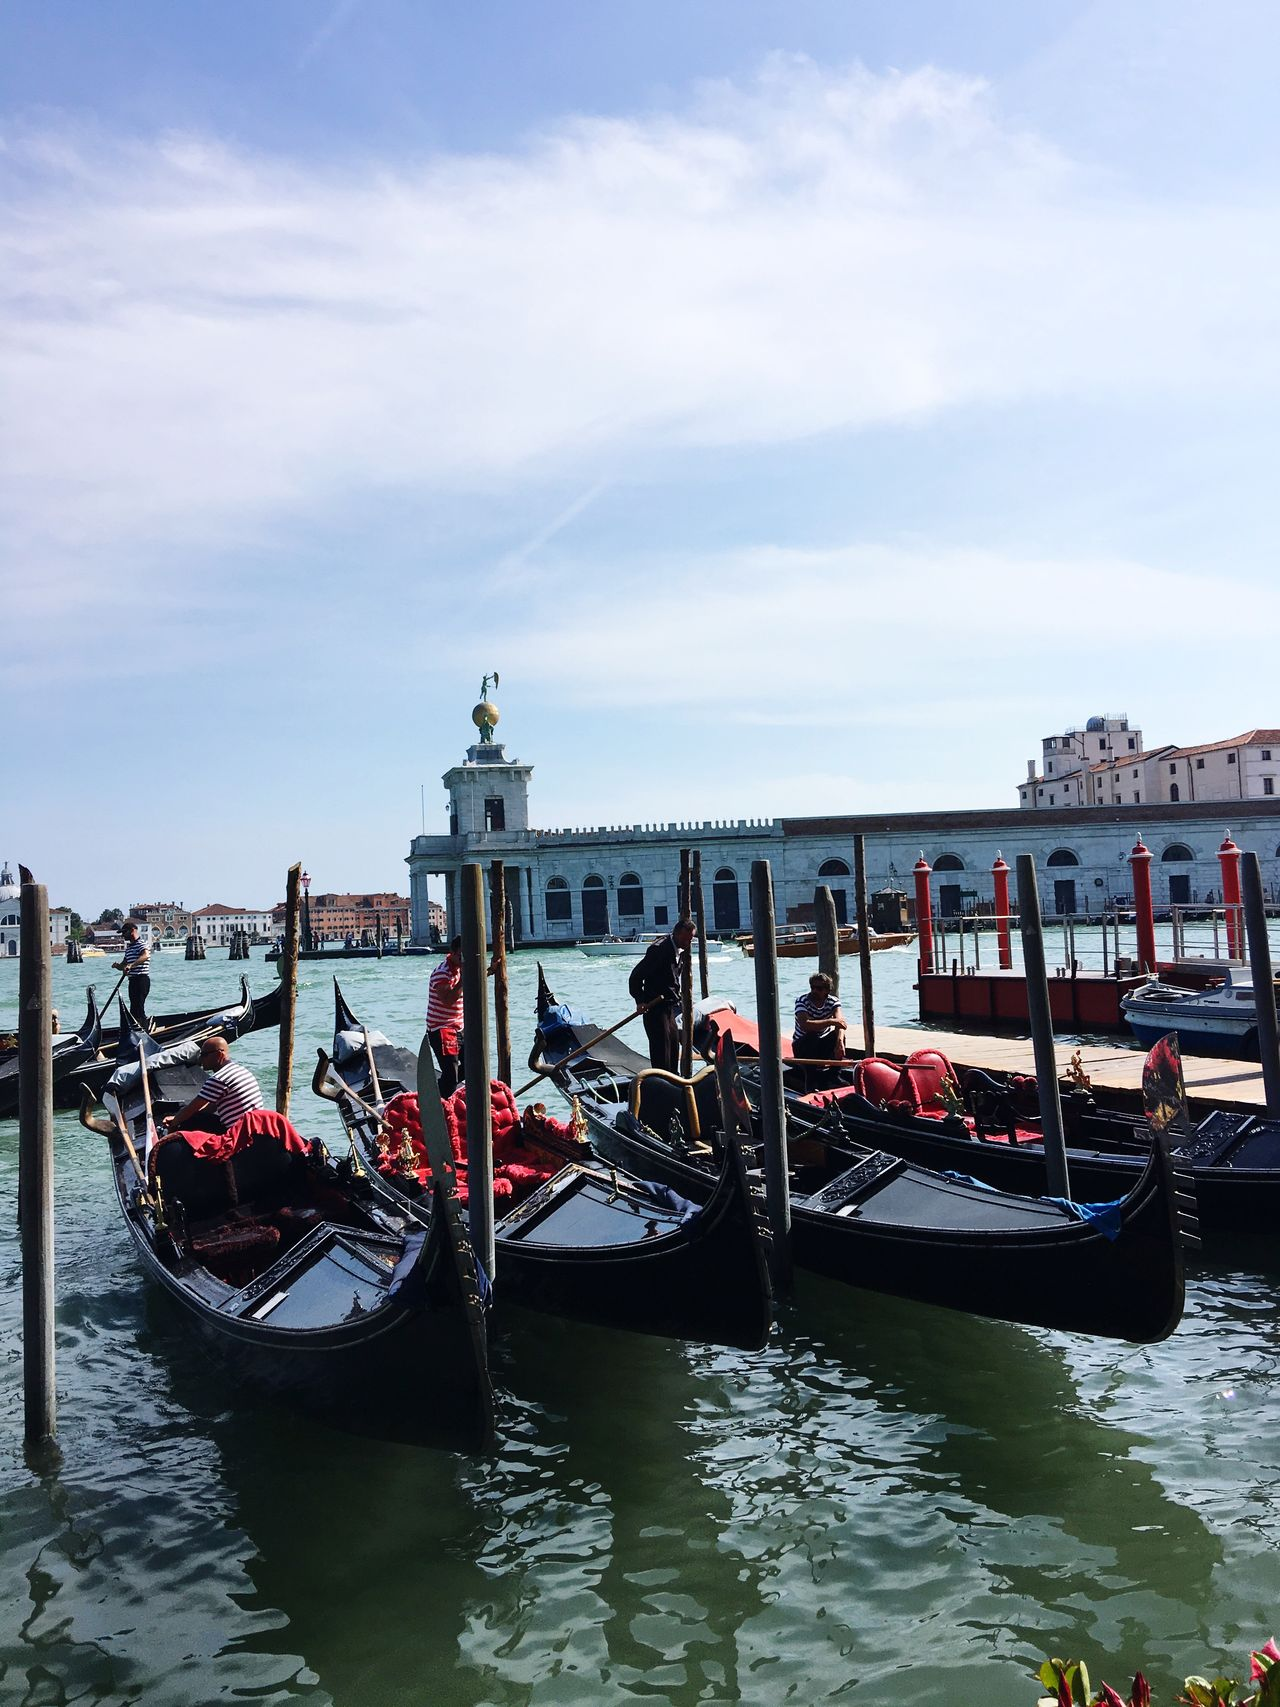 Venecia Venicelife Gondola Gondolas Gondole Gondole In Venice Gondola Ride Gondola - Traditional Boat Venice Venizia Venice View Travel Destinations Venice Canals Travel Photography Italy🇮🇹 Italia EyeEm